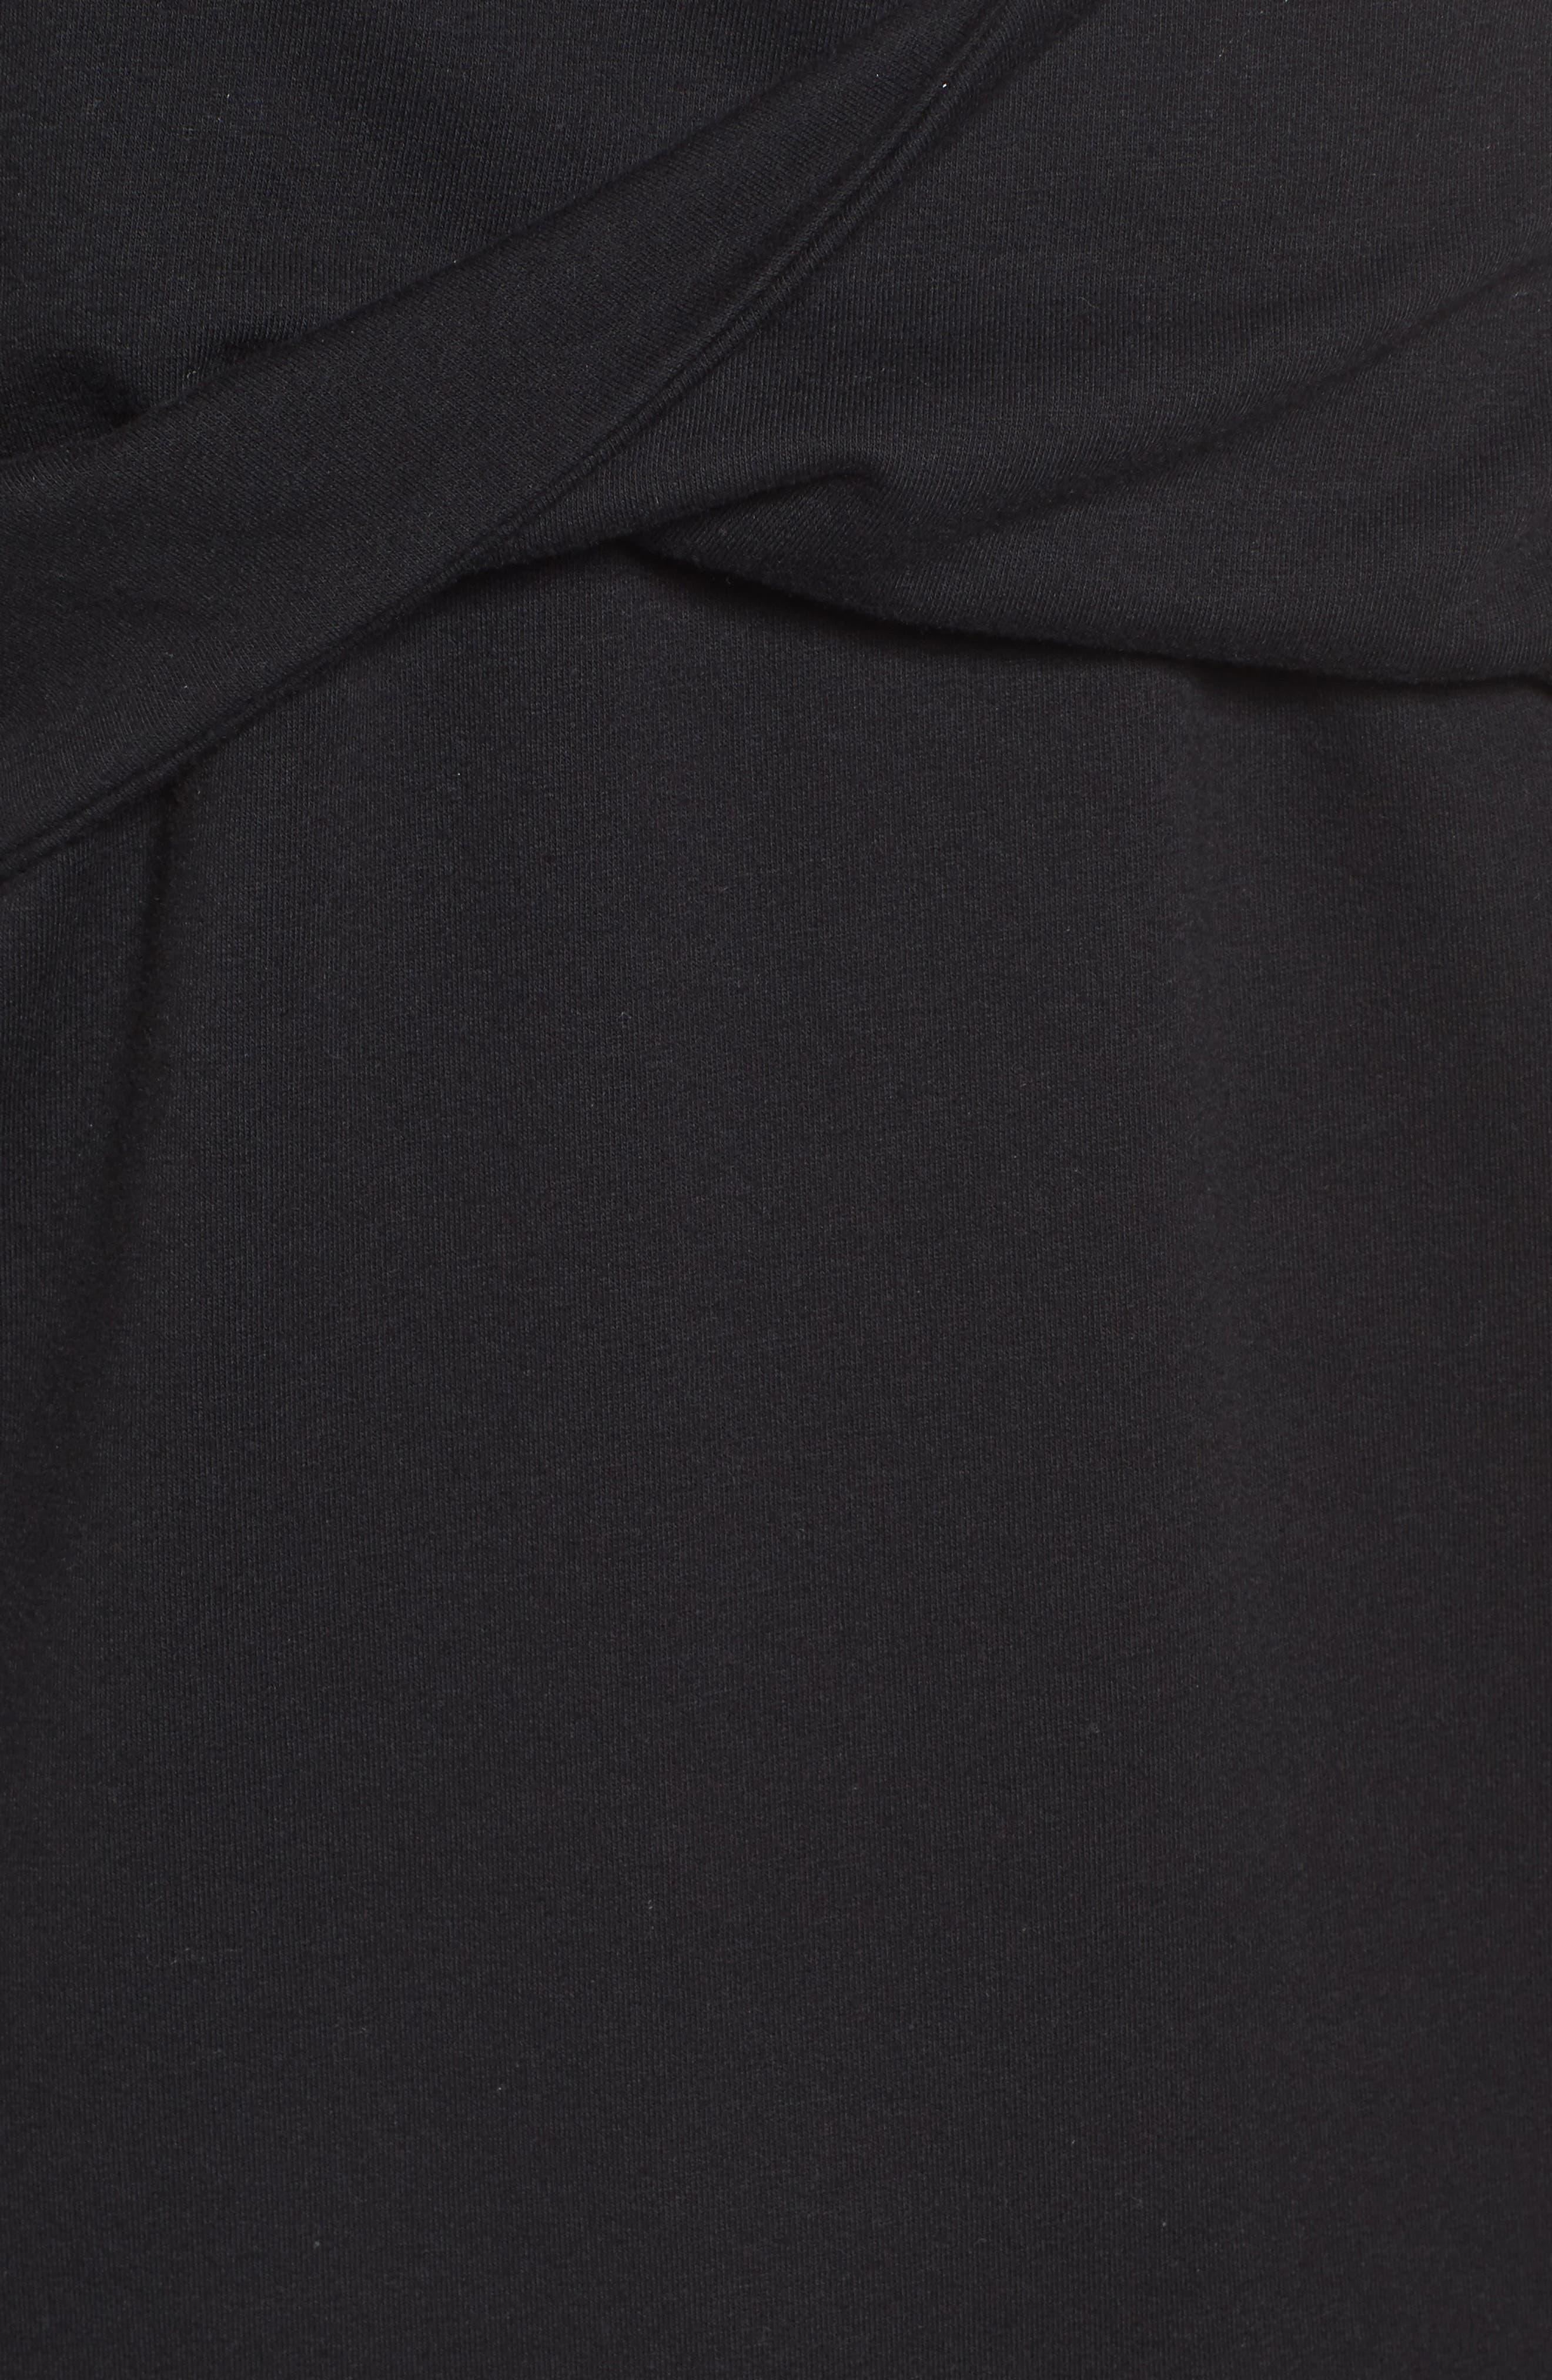 Twist Front Sweatshirt,                             Alternate thumbnail 9, color,